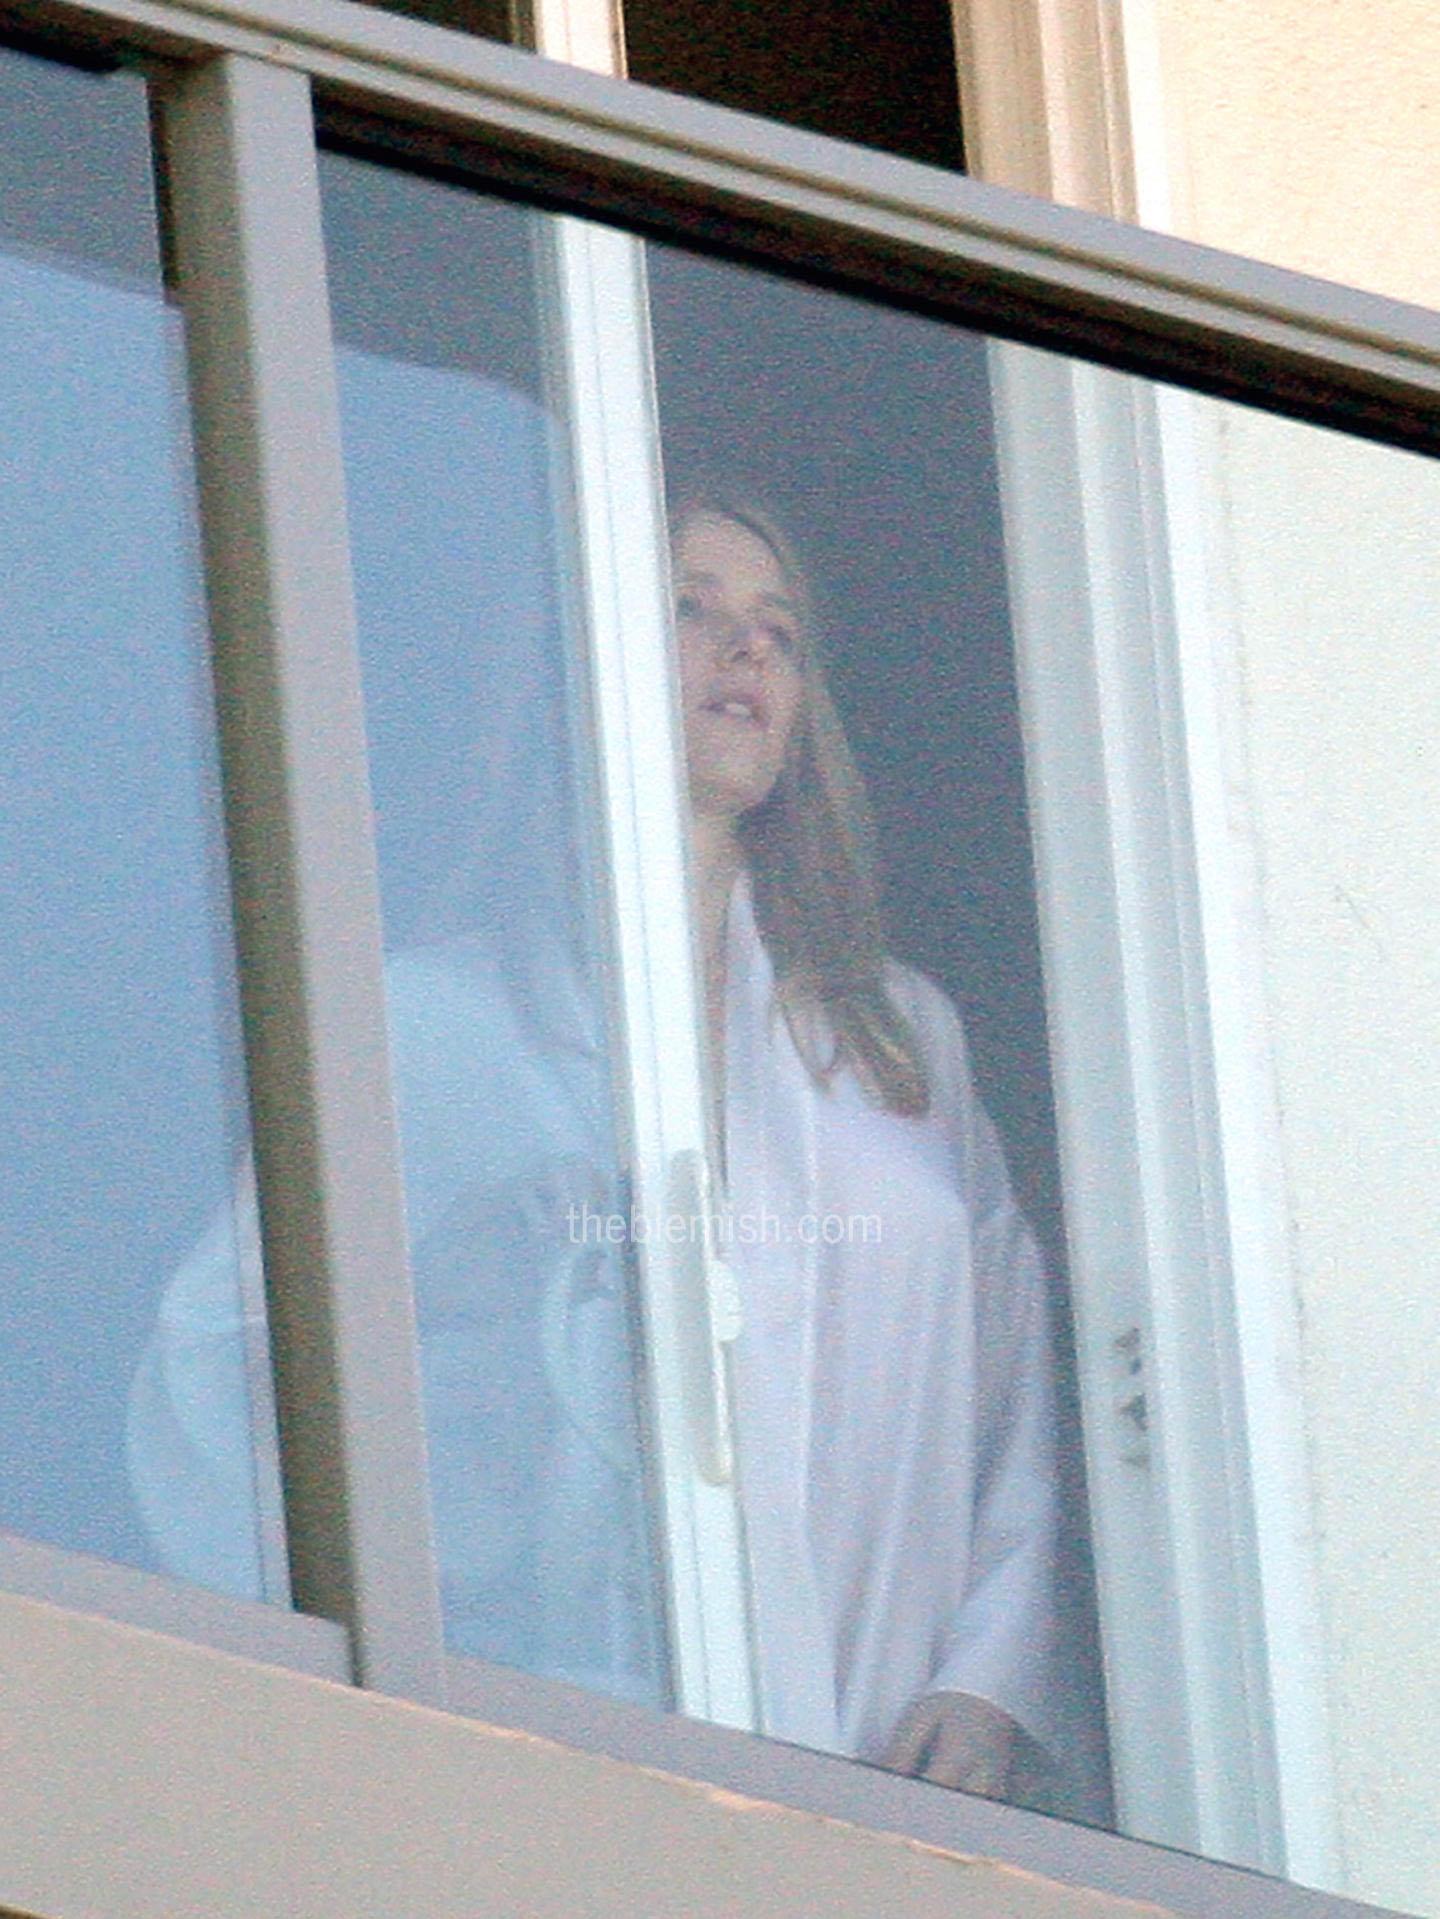 Watts nude on balcony naomi